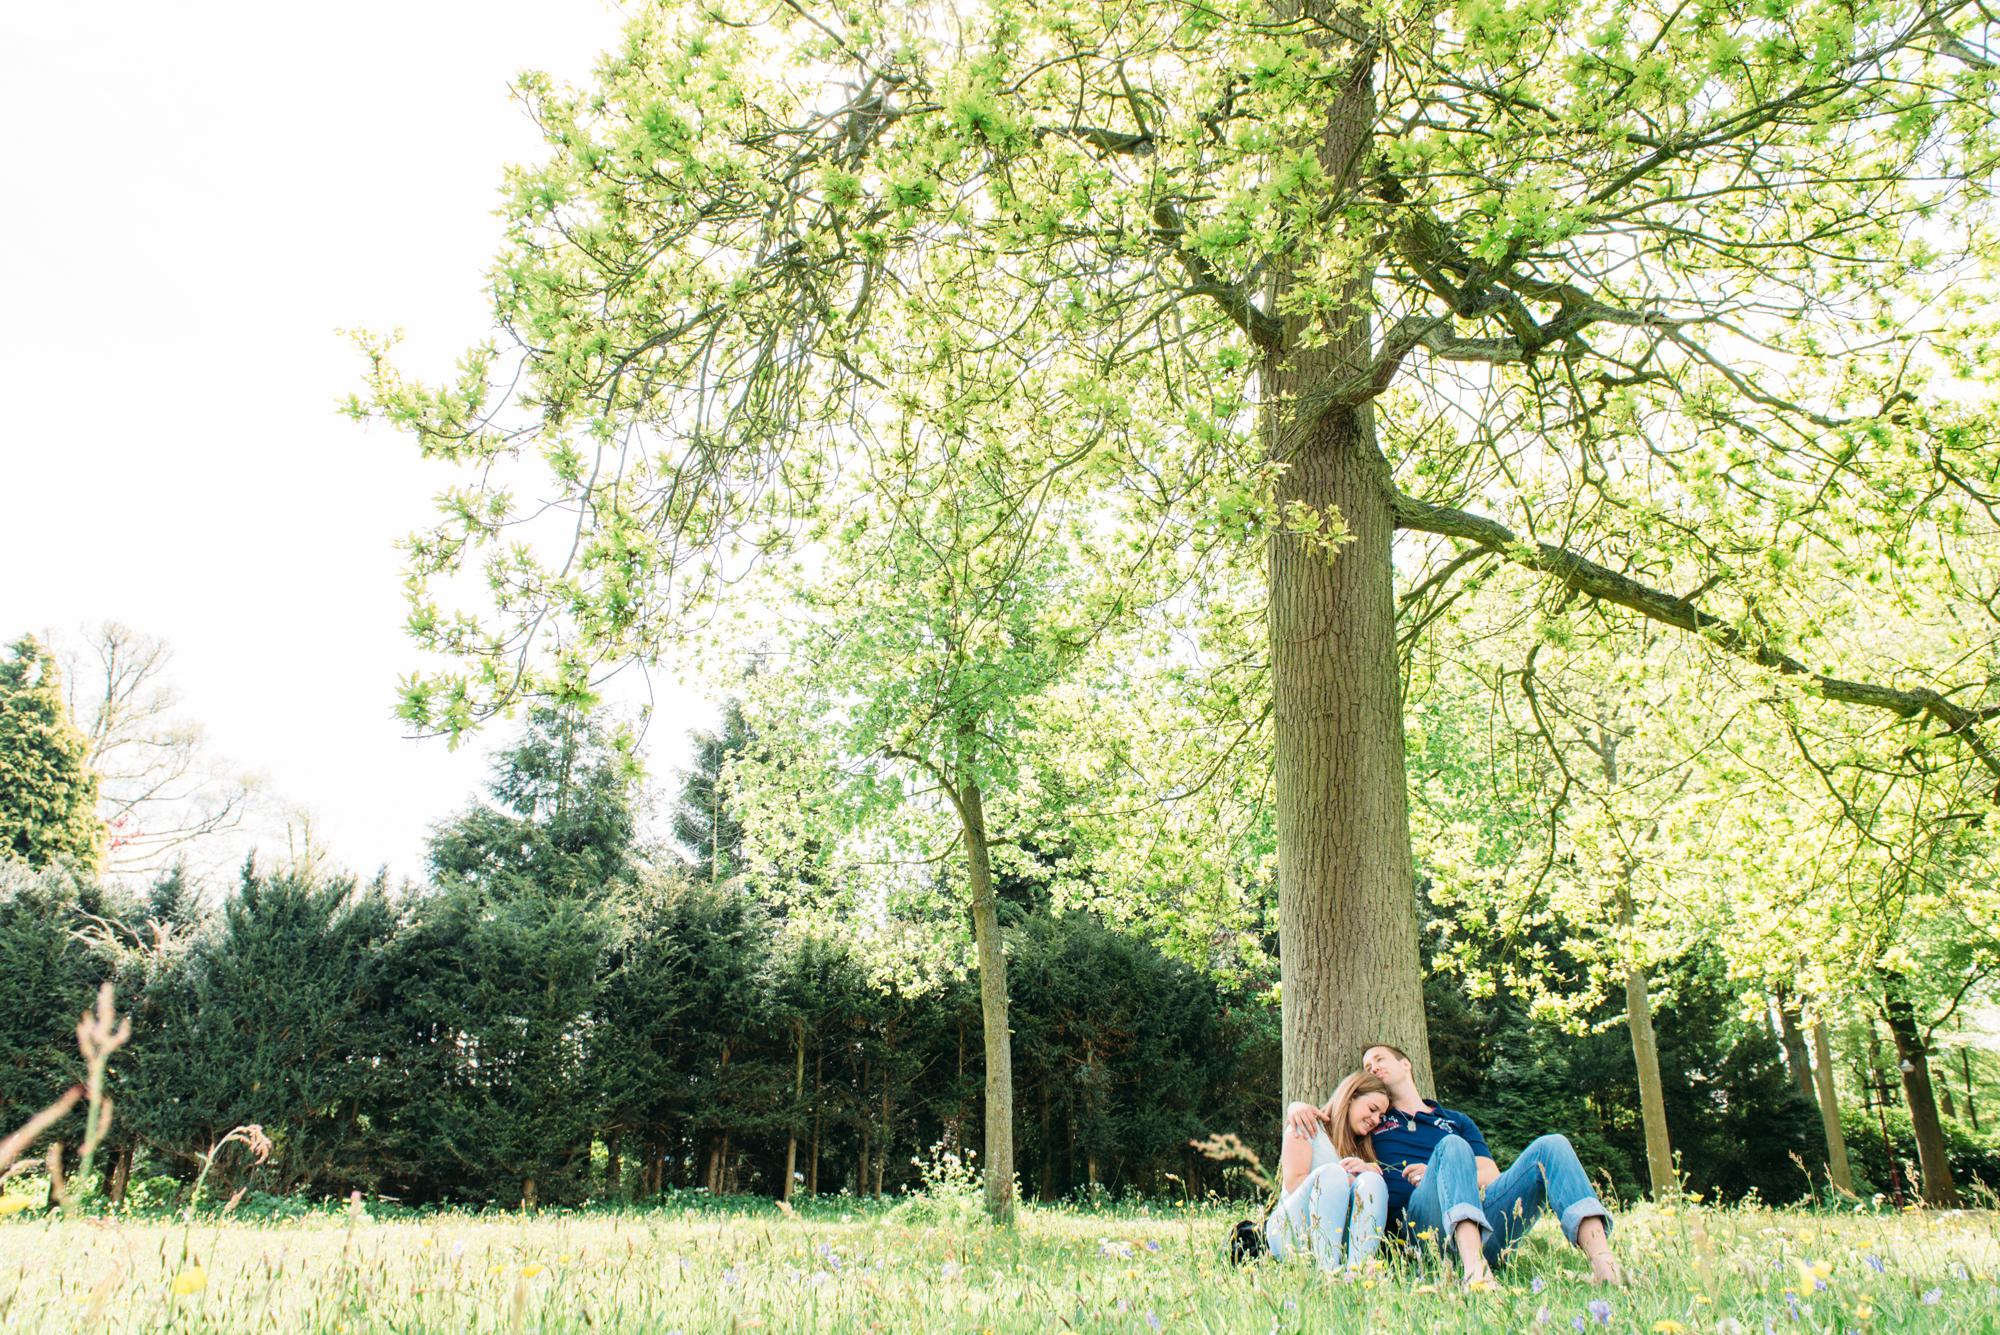 loveshoot-orangerie-elswout-rachelle-en-michael-26